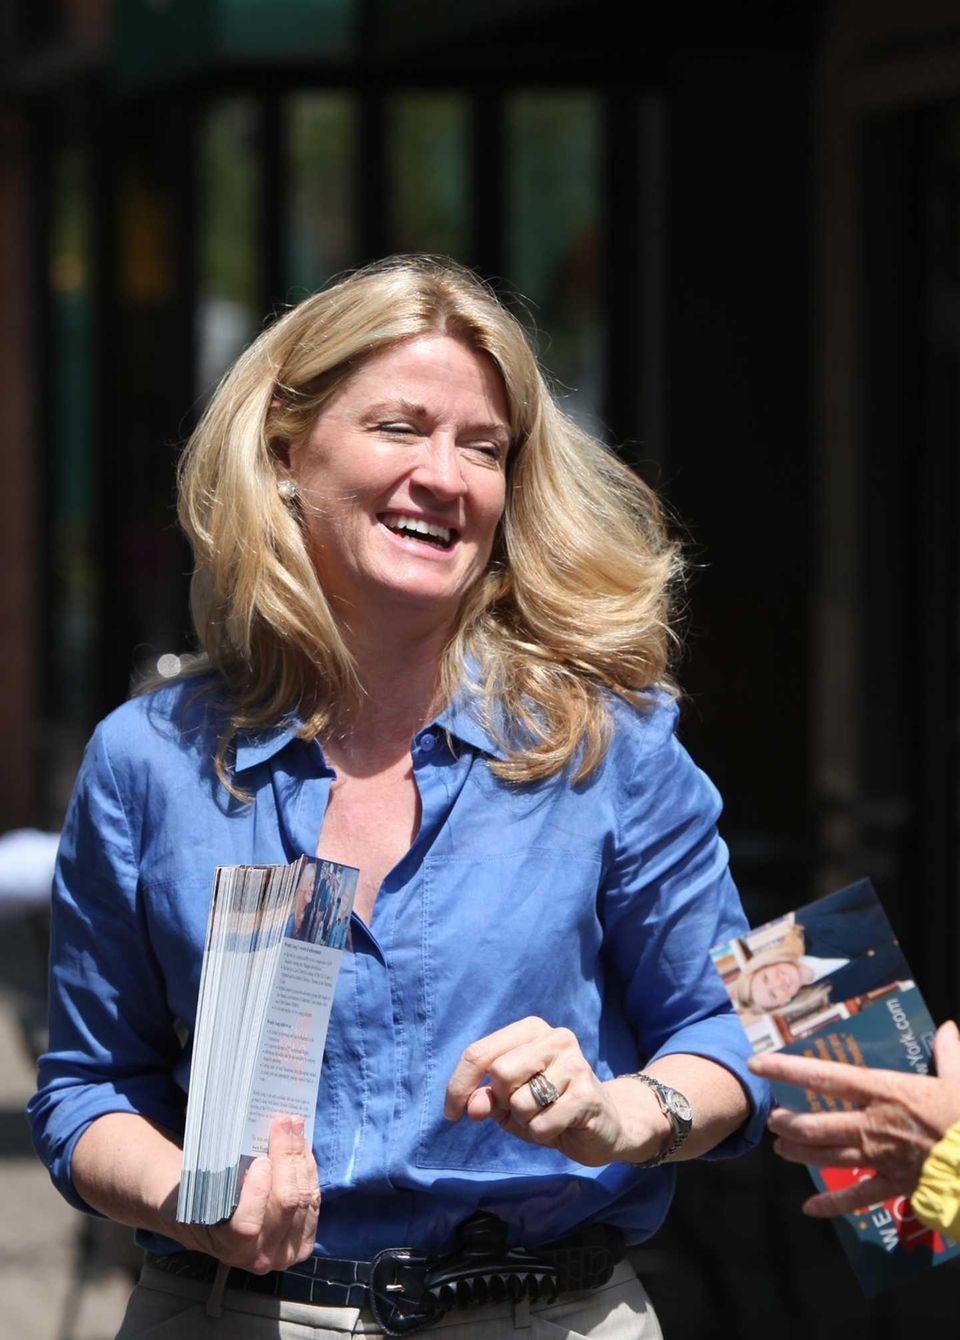 U.S. Senate candidate Wendy Long campaigns in Garden